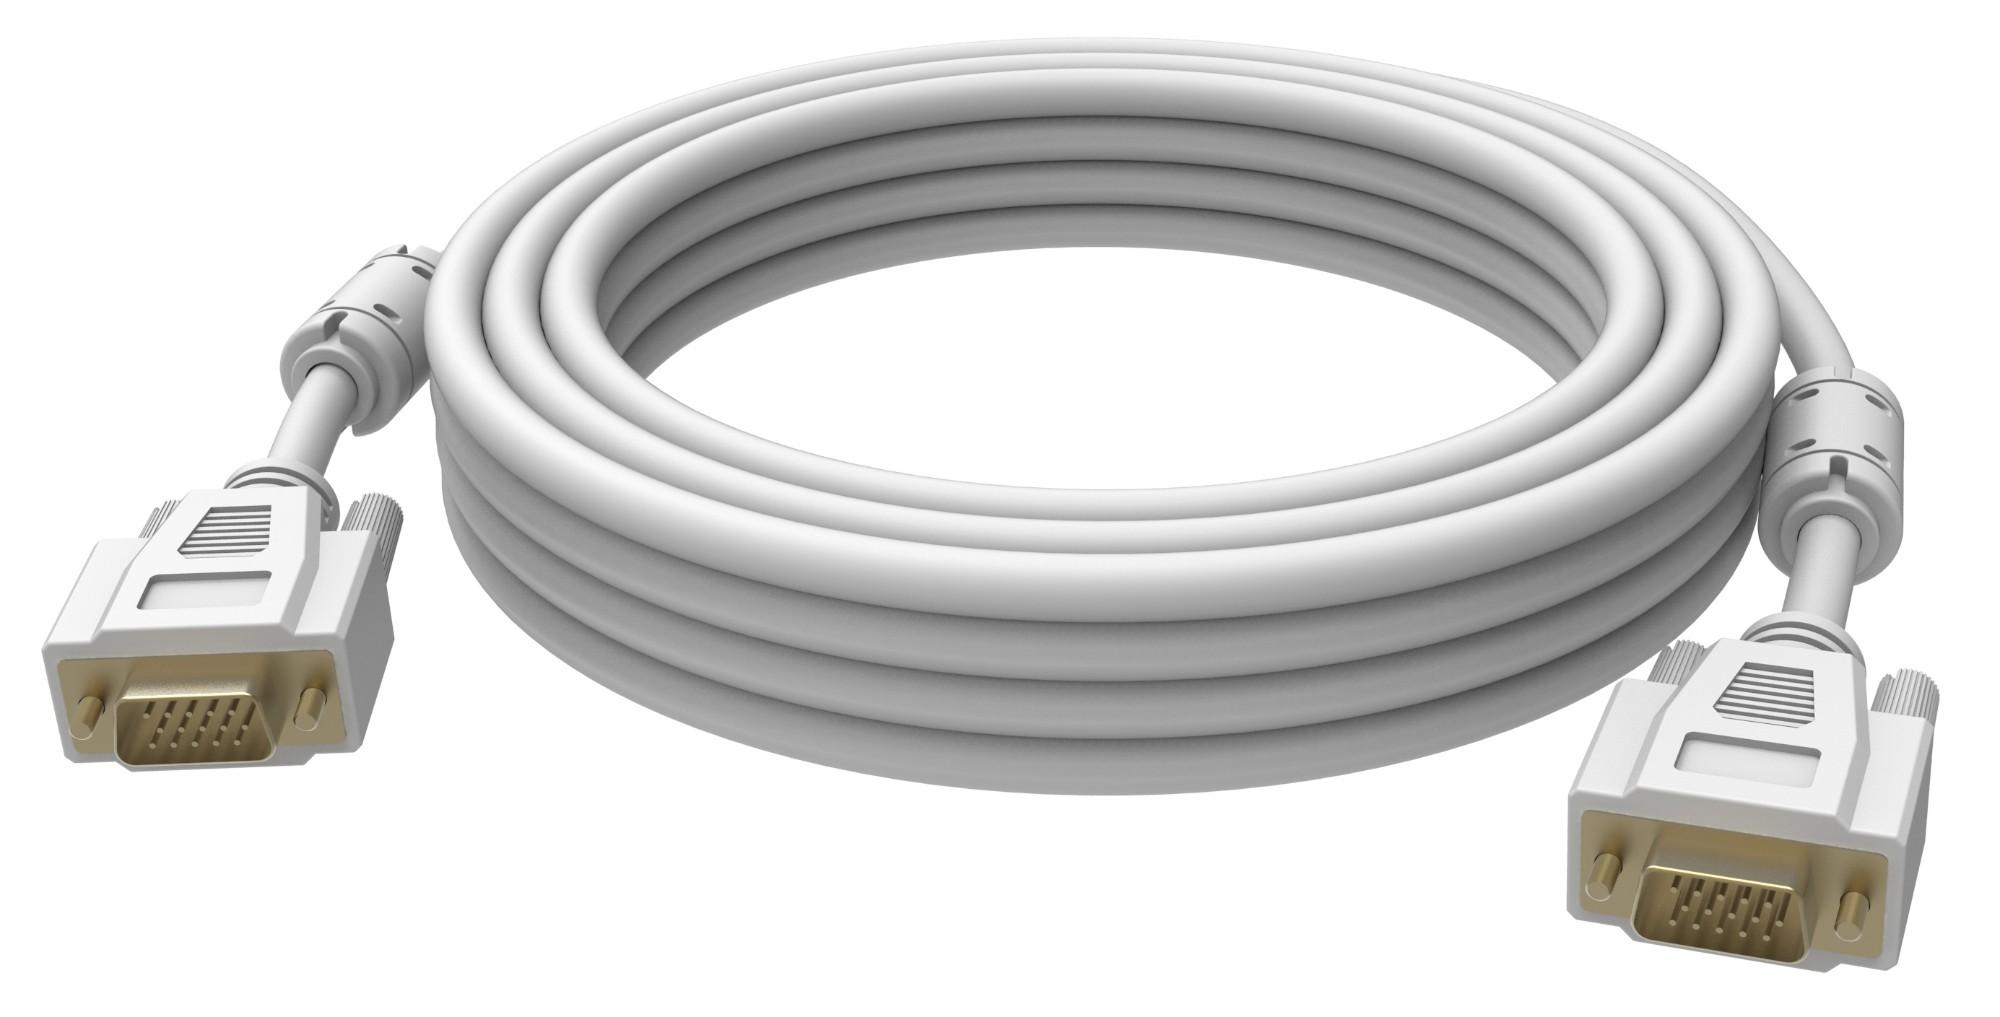 Vision 2x VGA 15-pin D-Sub, 20m cable VGA VGA (D-Sub) Blanco